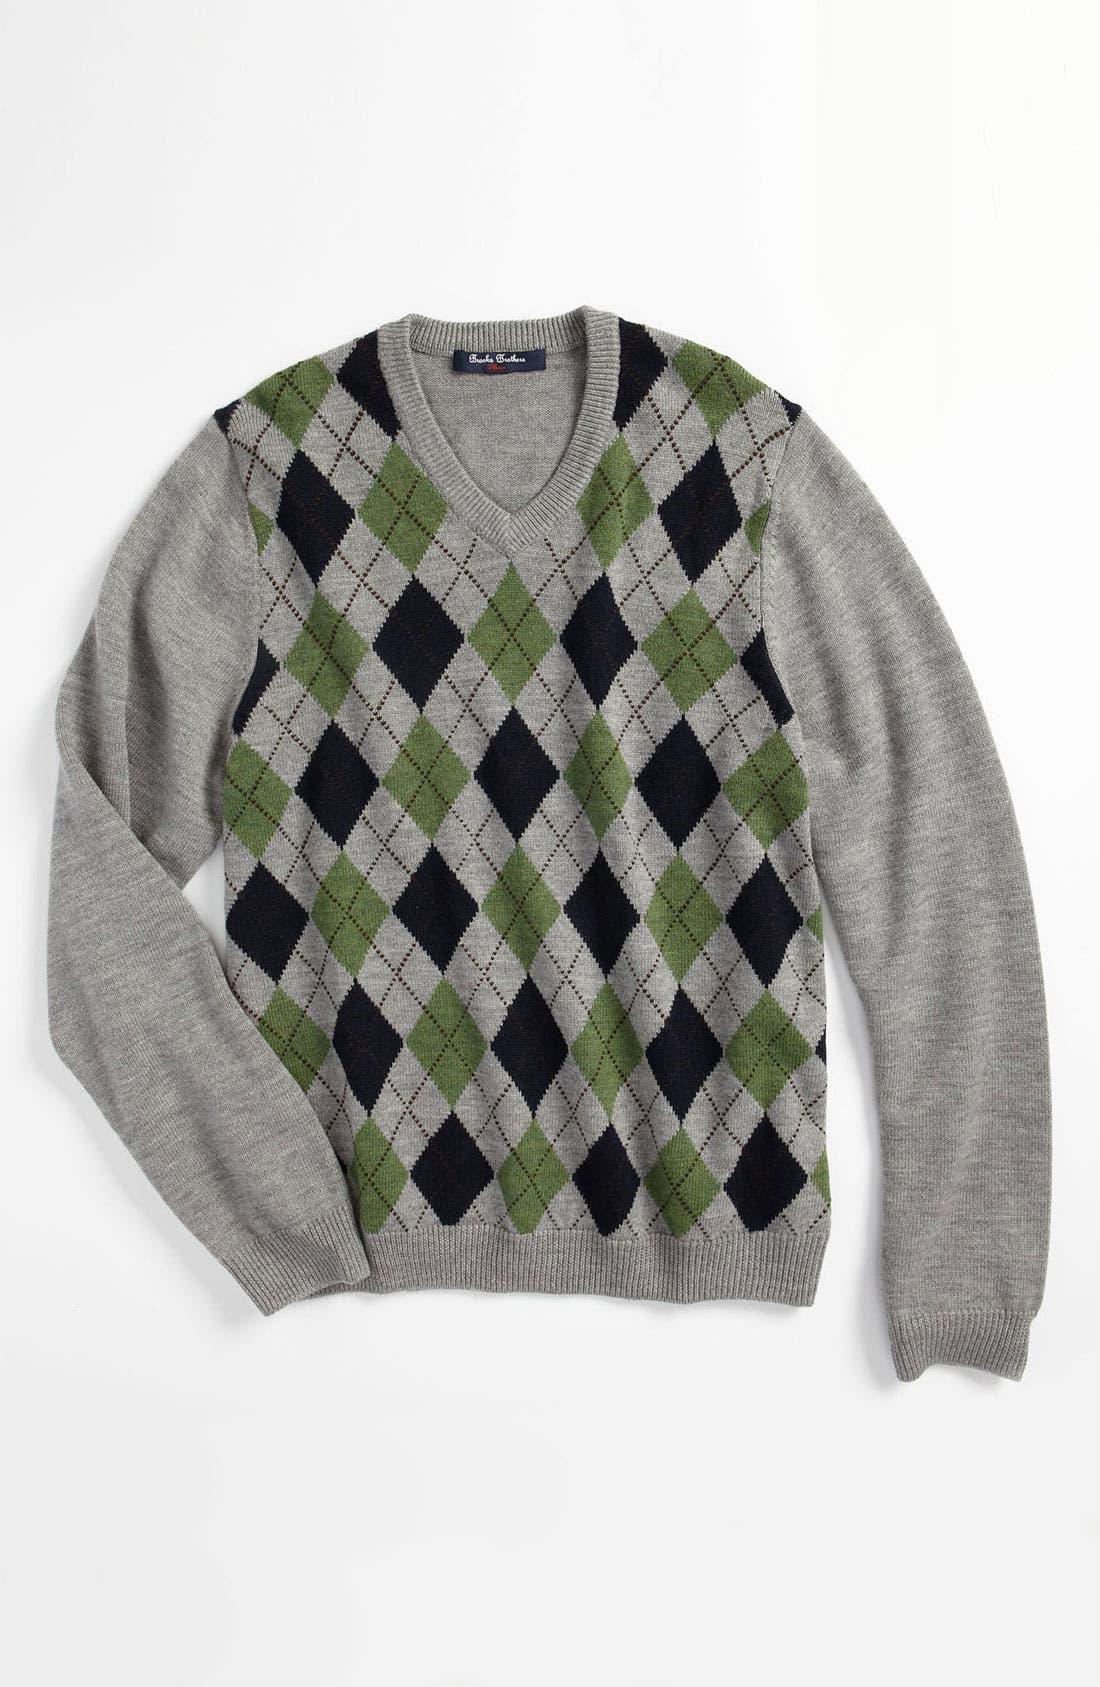 Alternate Image 1 Selected - Brooks Brothers Argyle V-Neck Sweater (Big Boys)